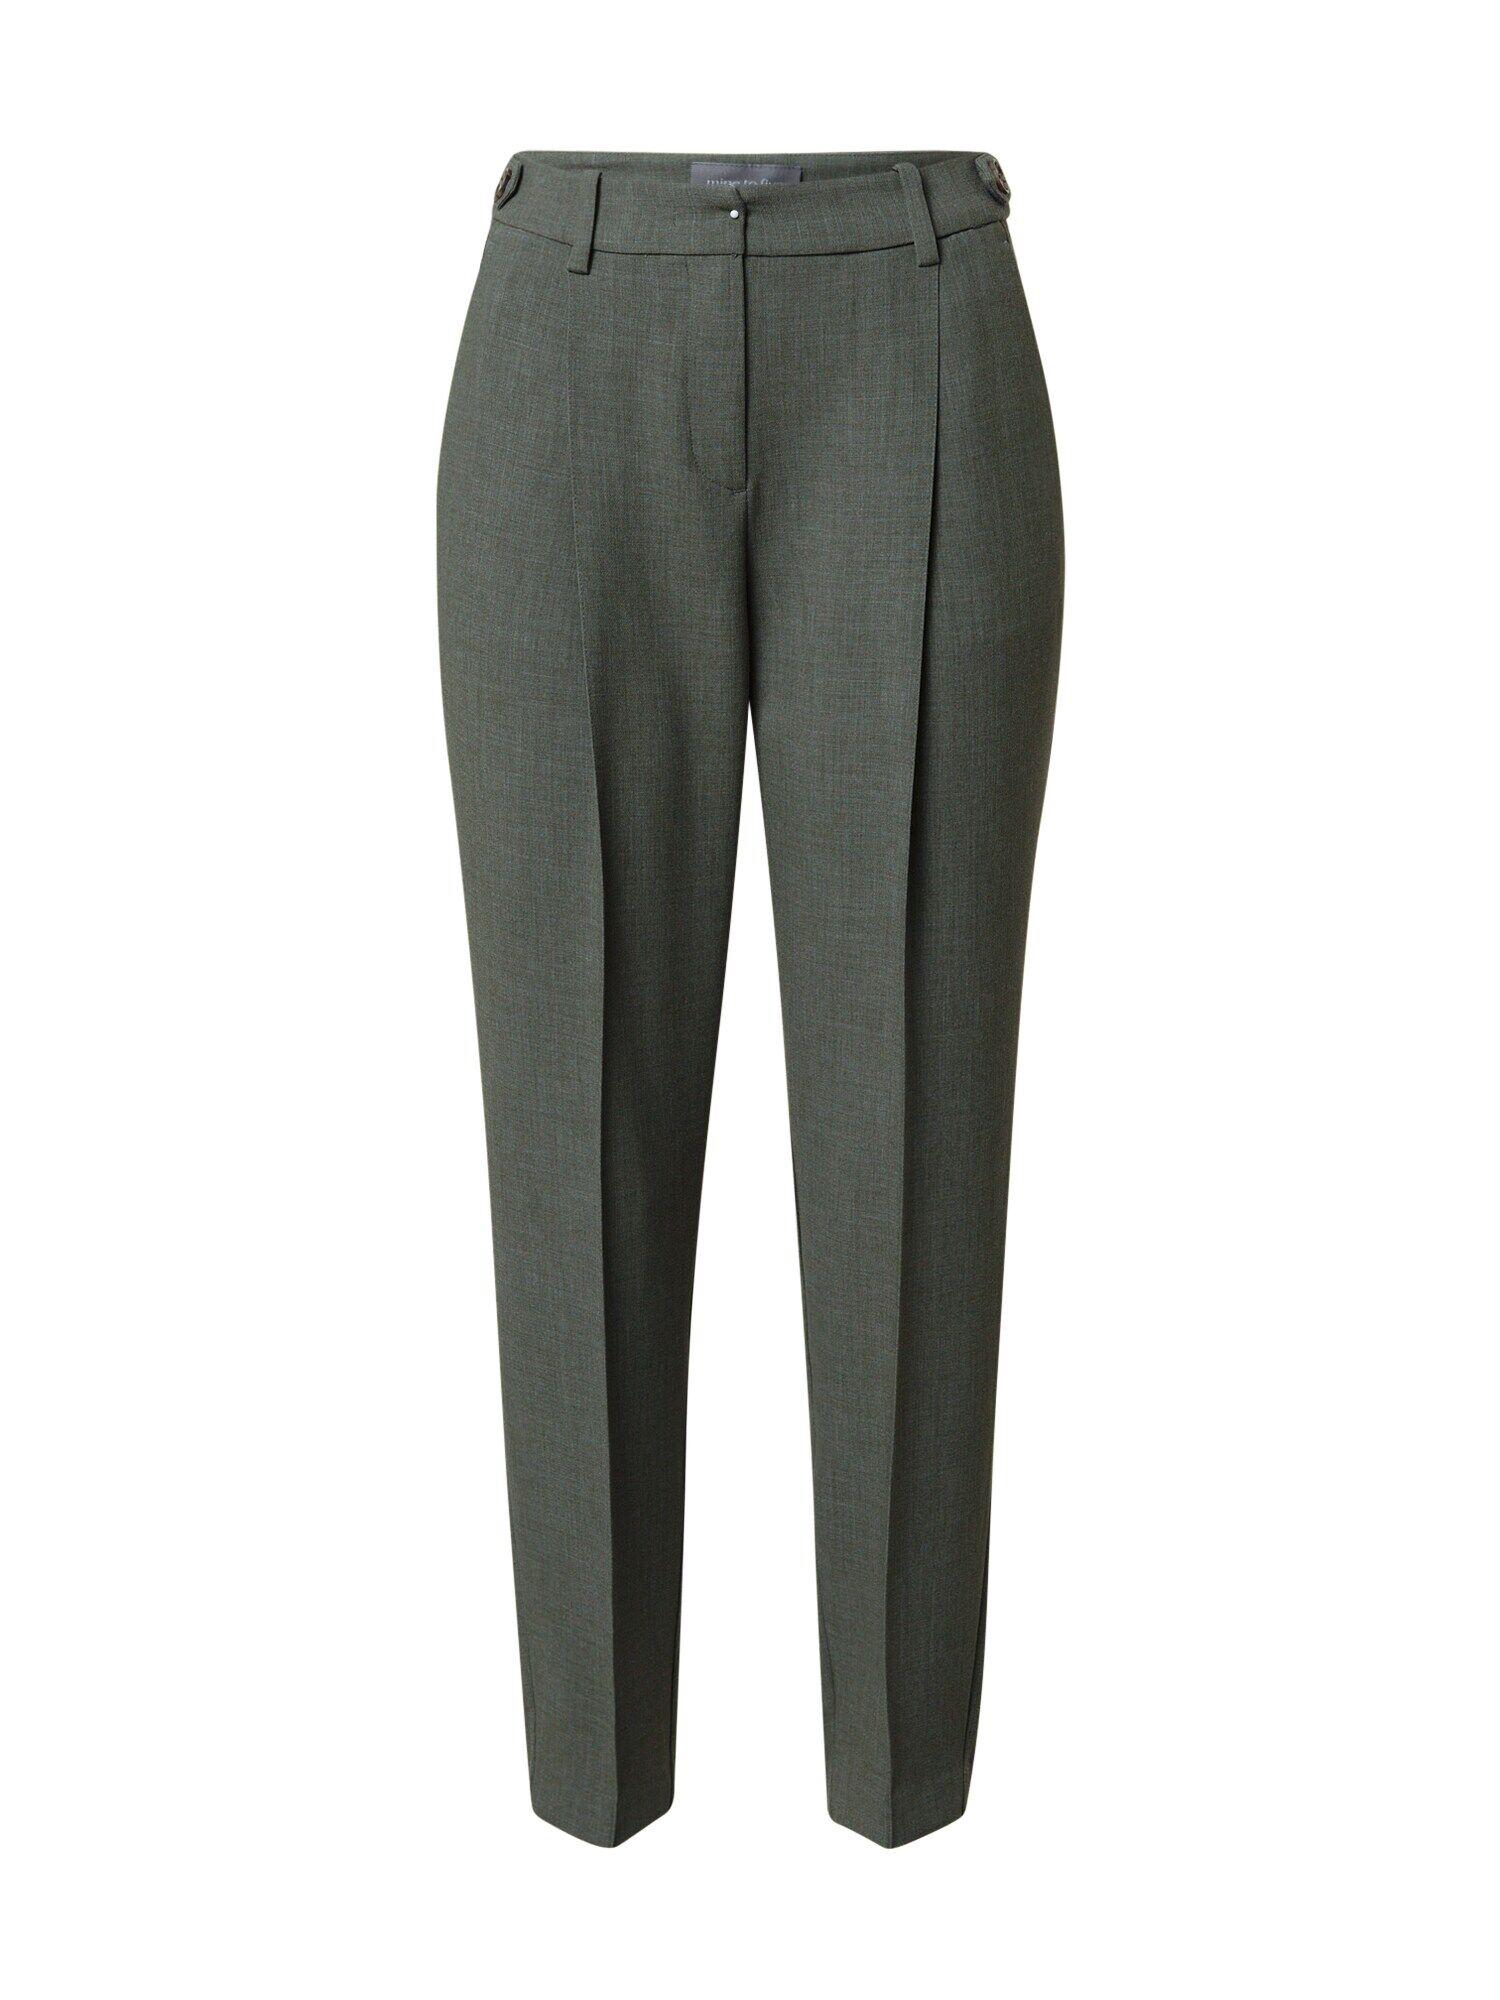 MINE TO FIVE Pantalon à pince  - Vert - Taille: 34 - female